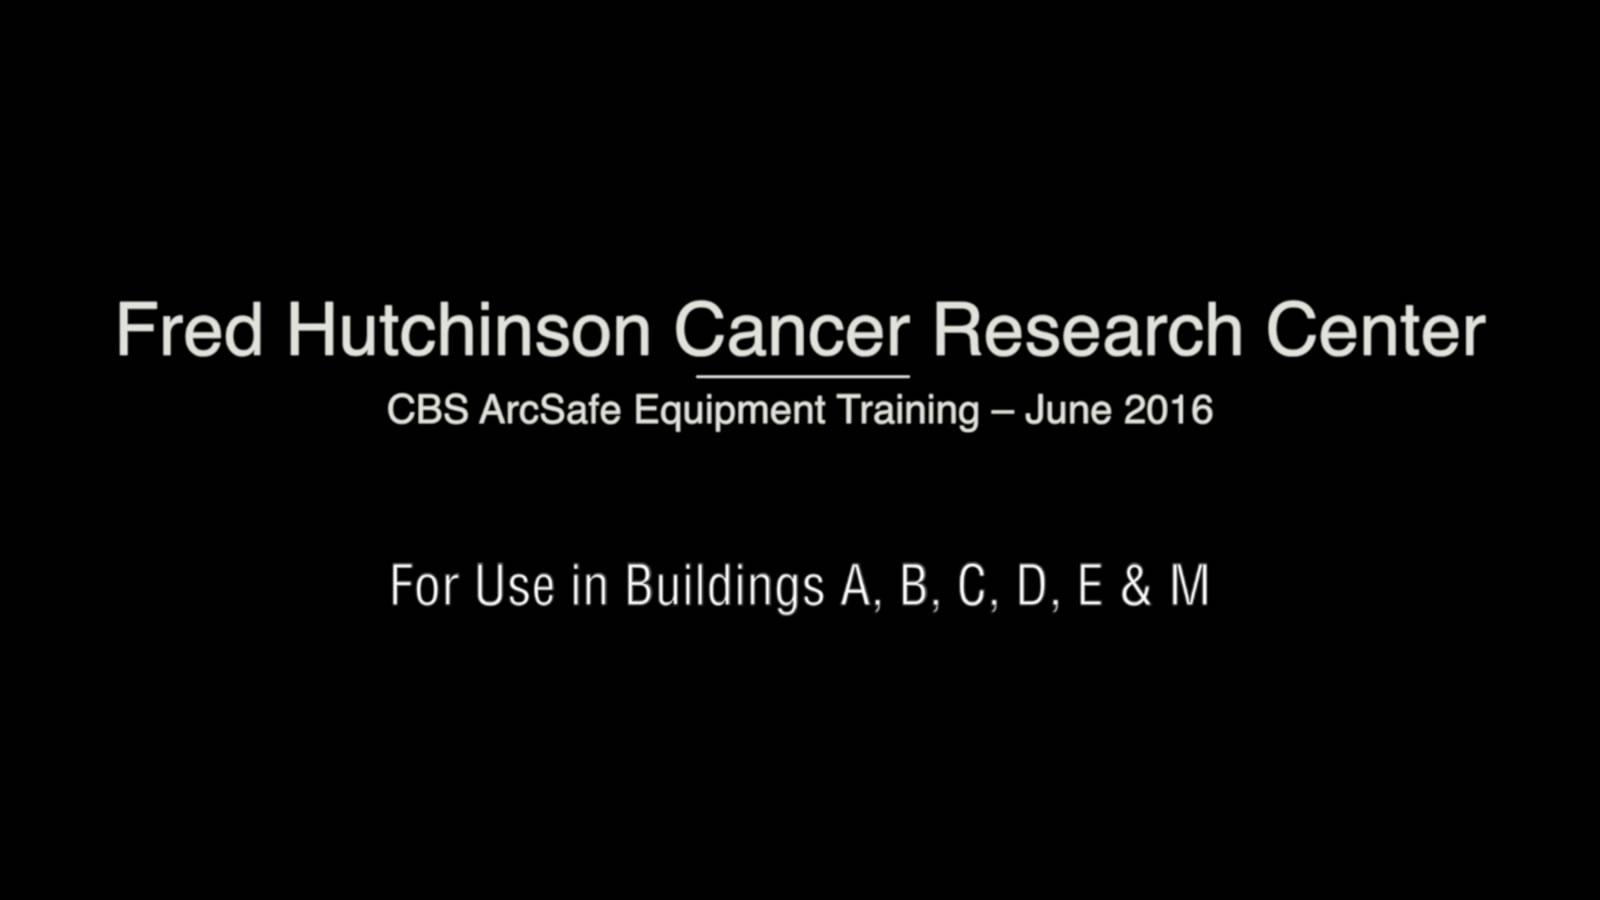 Fred Hutch Training Video